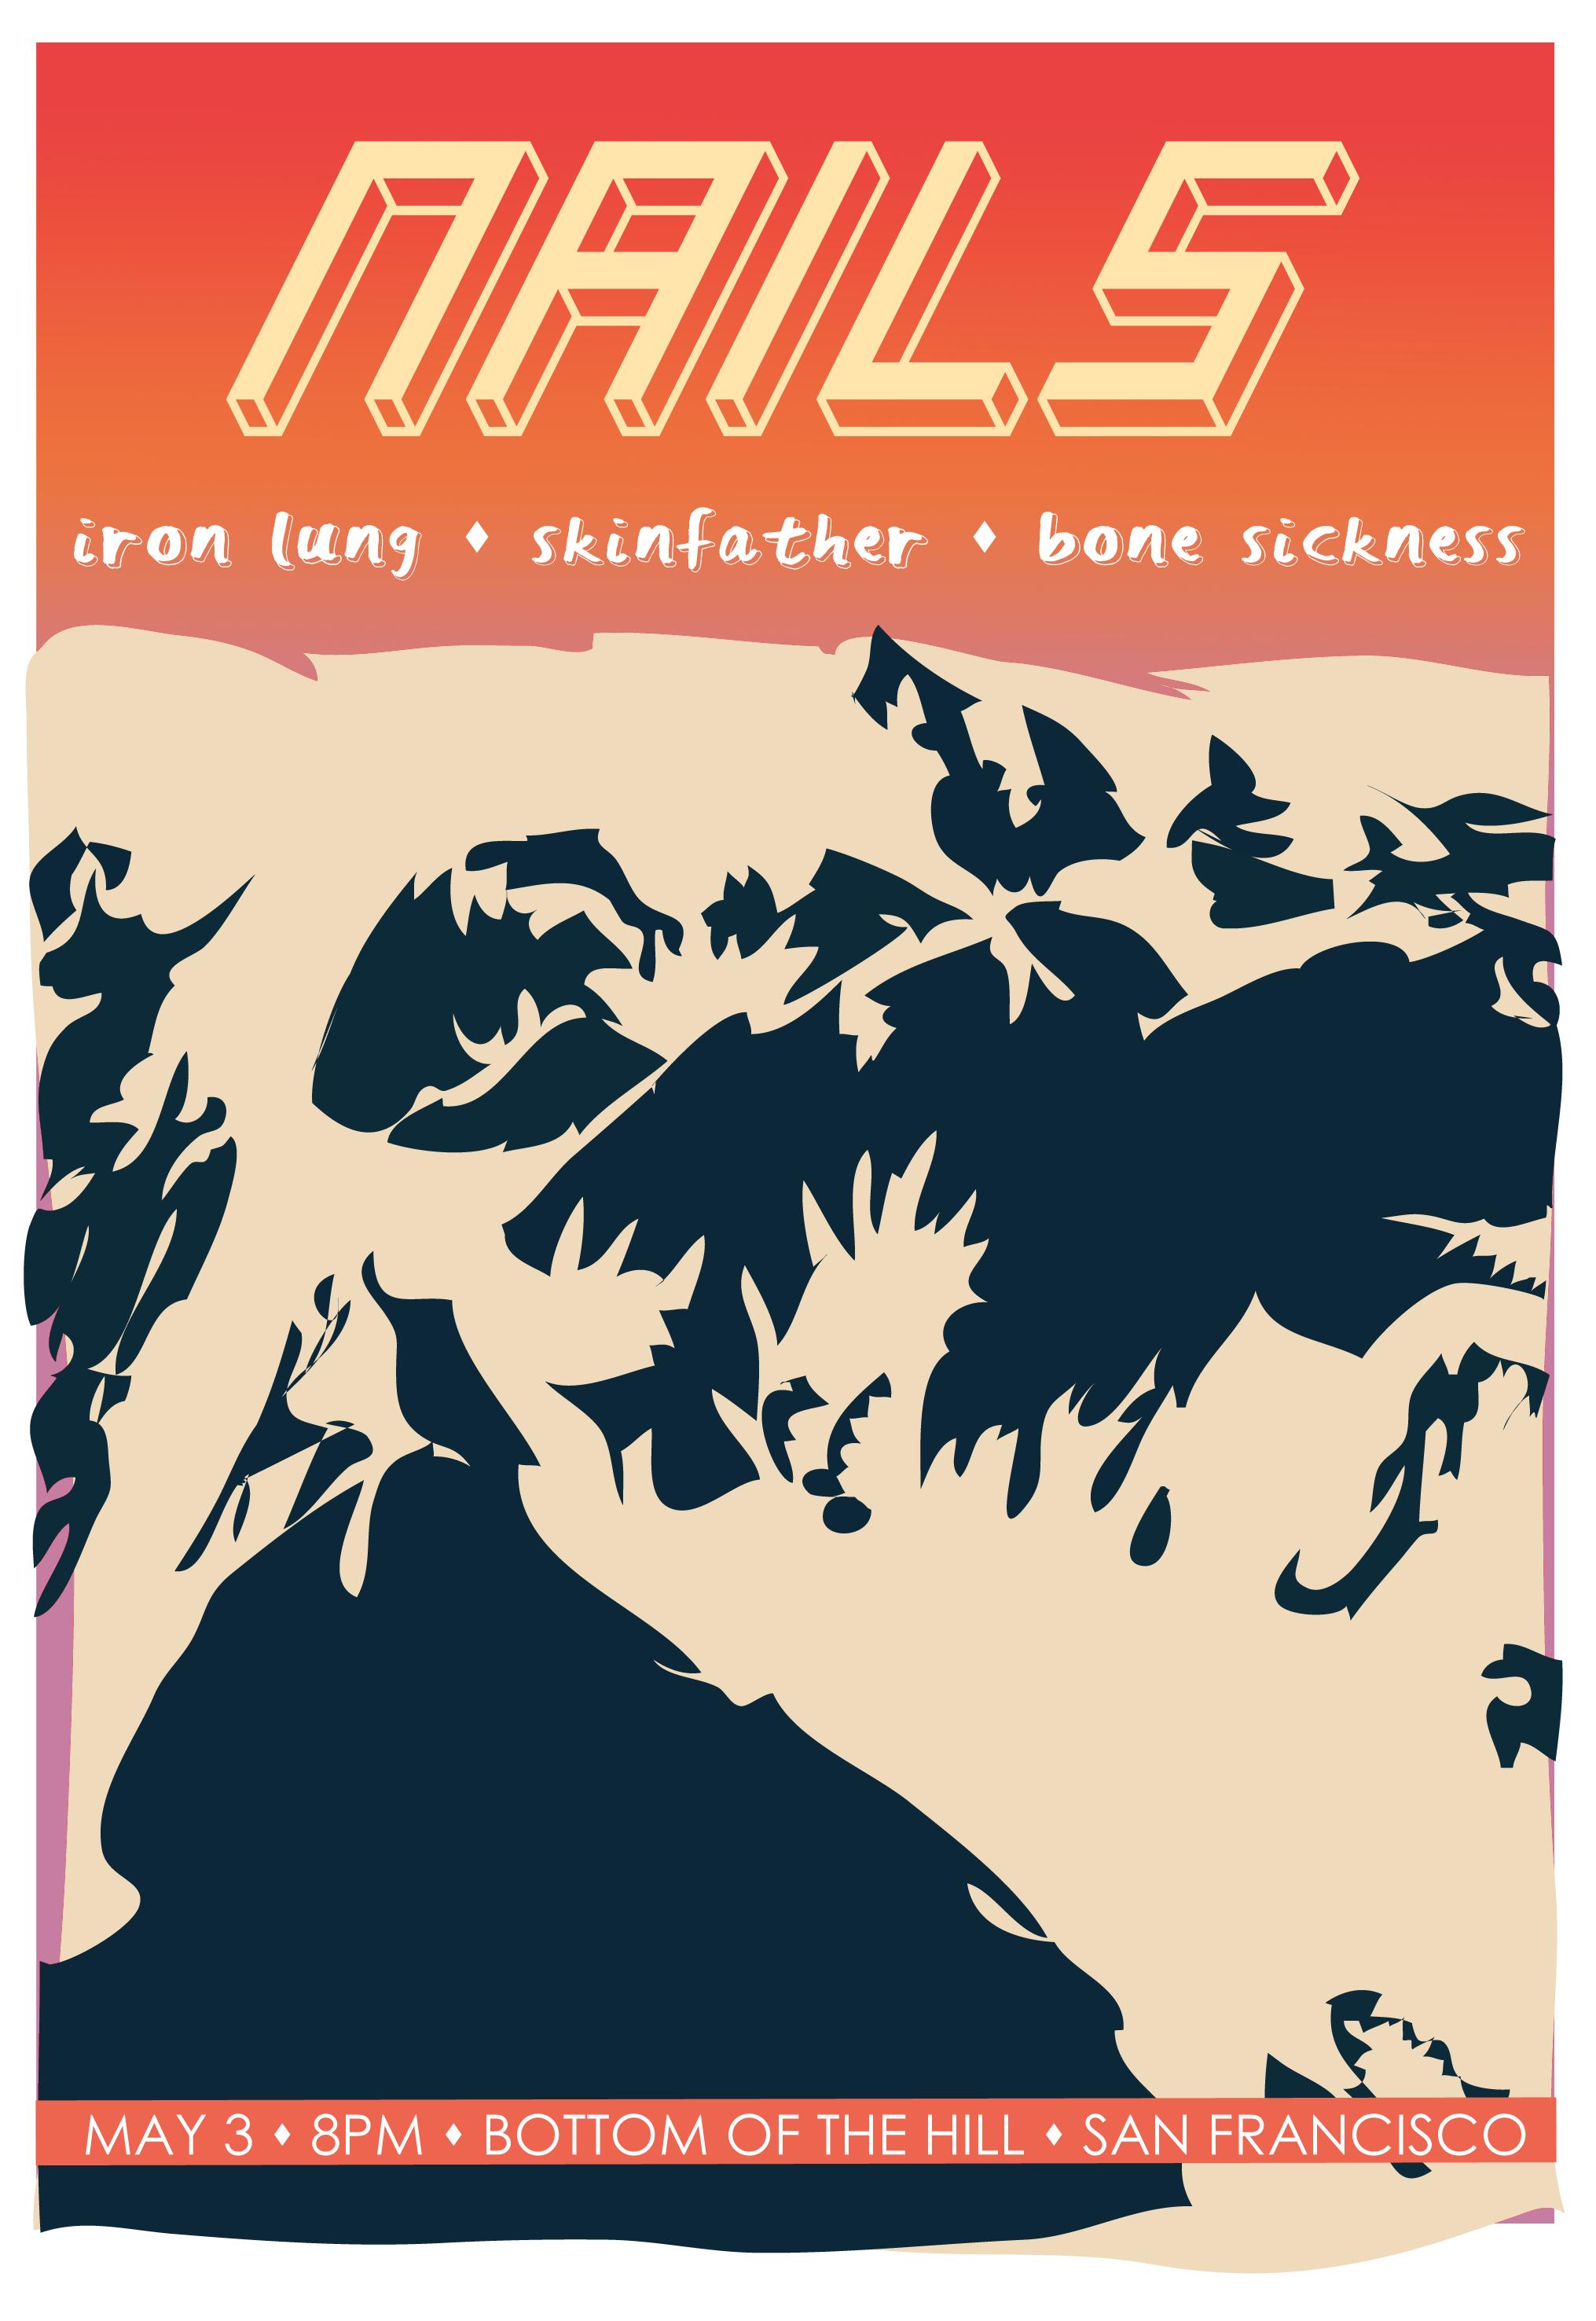 Hardcore bands, Local flyer. Adobe Illustrator